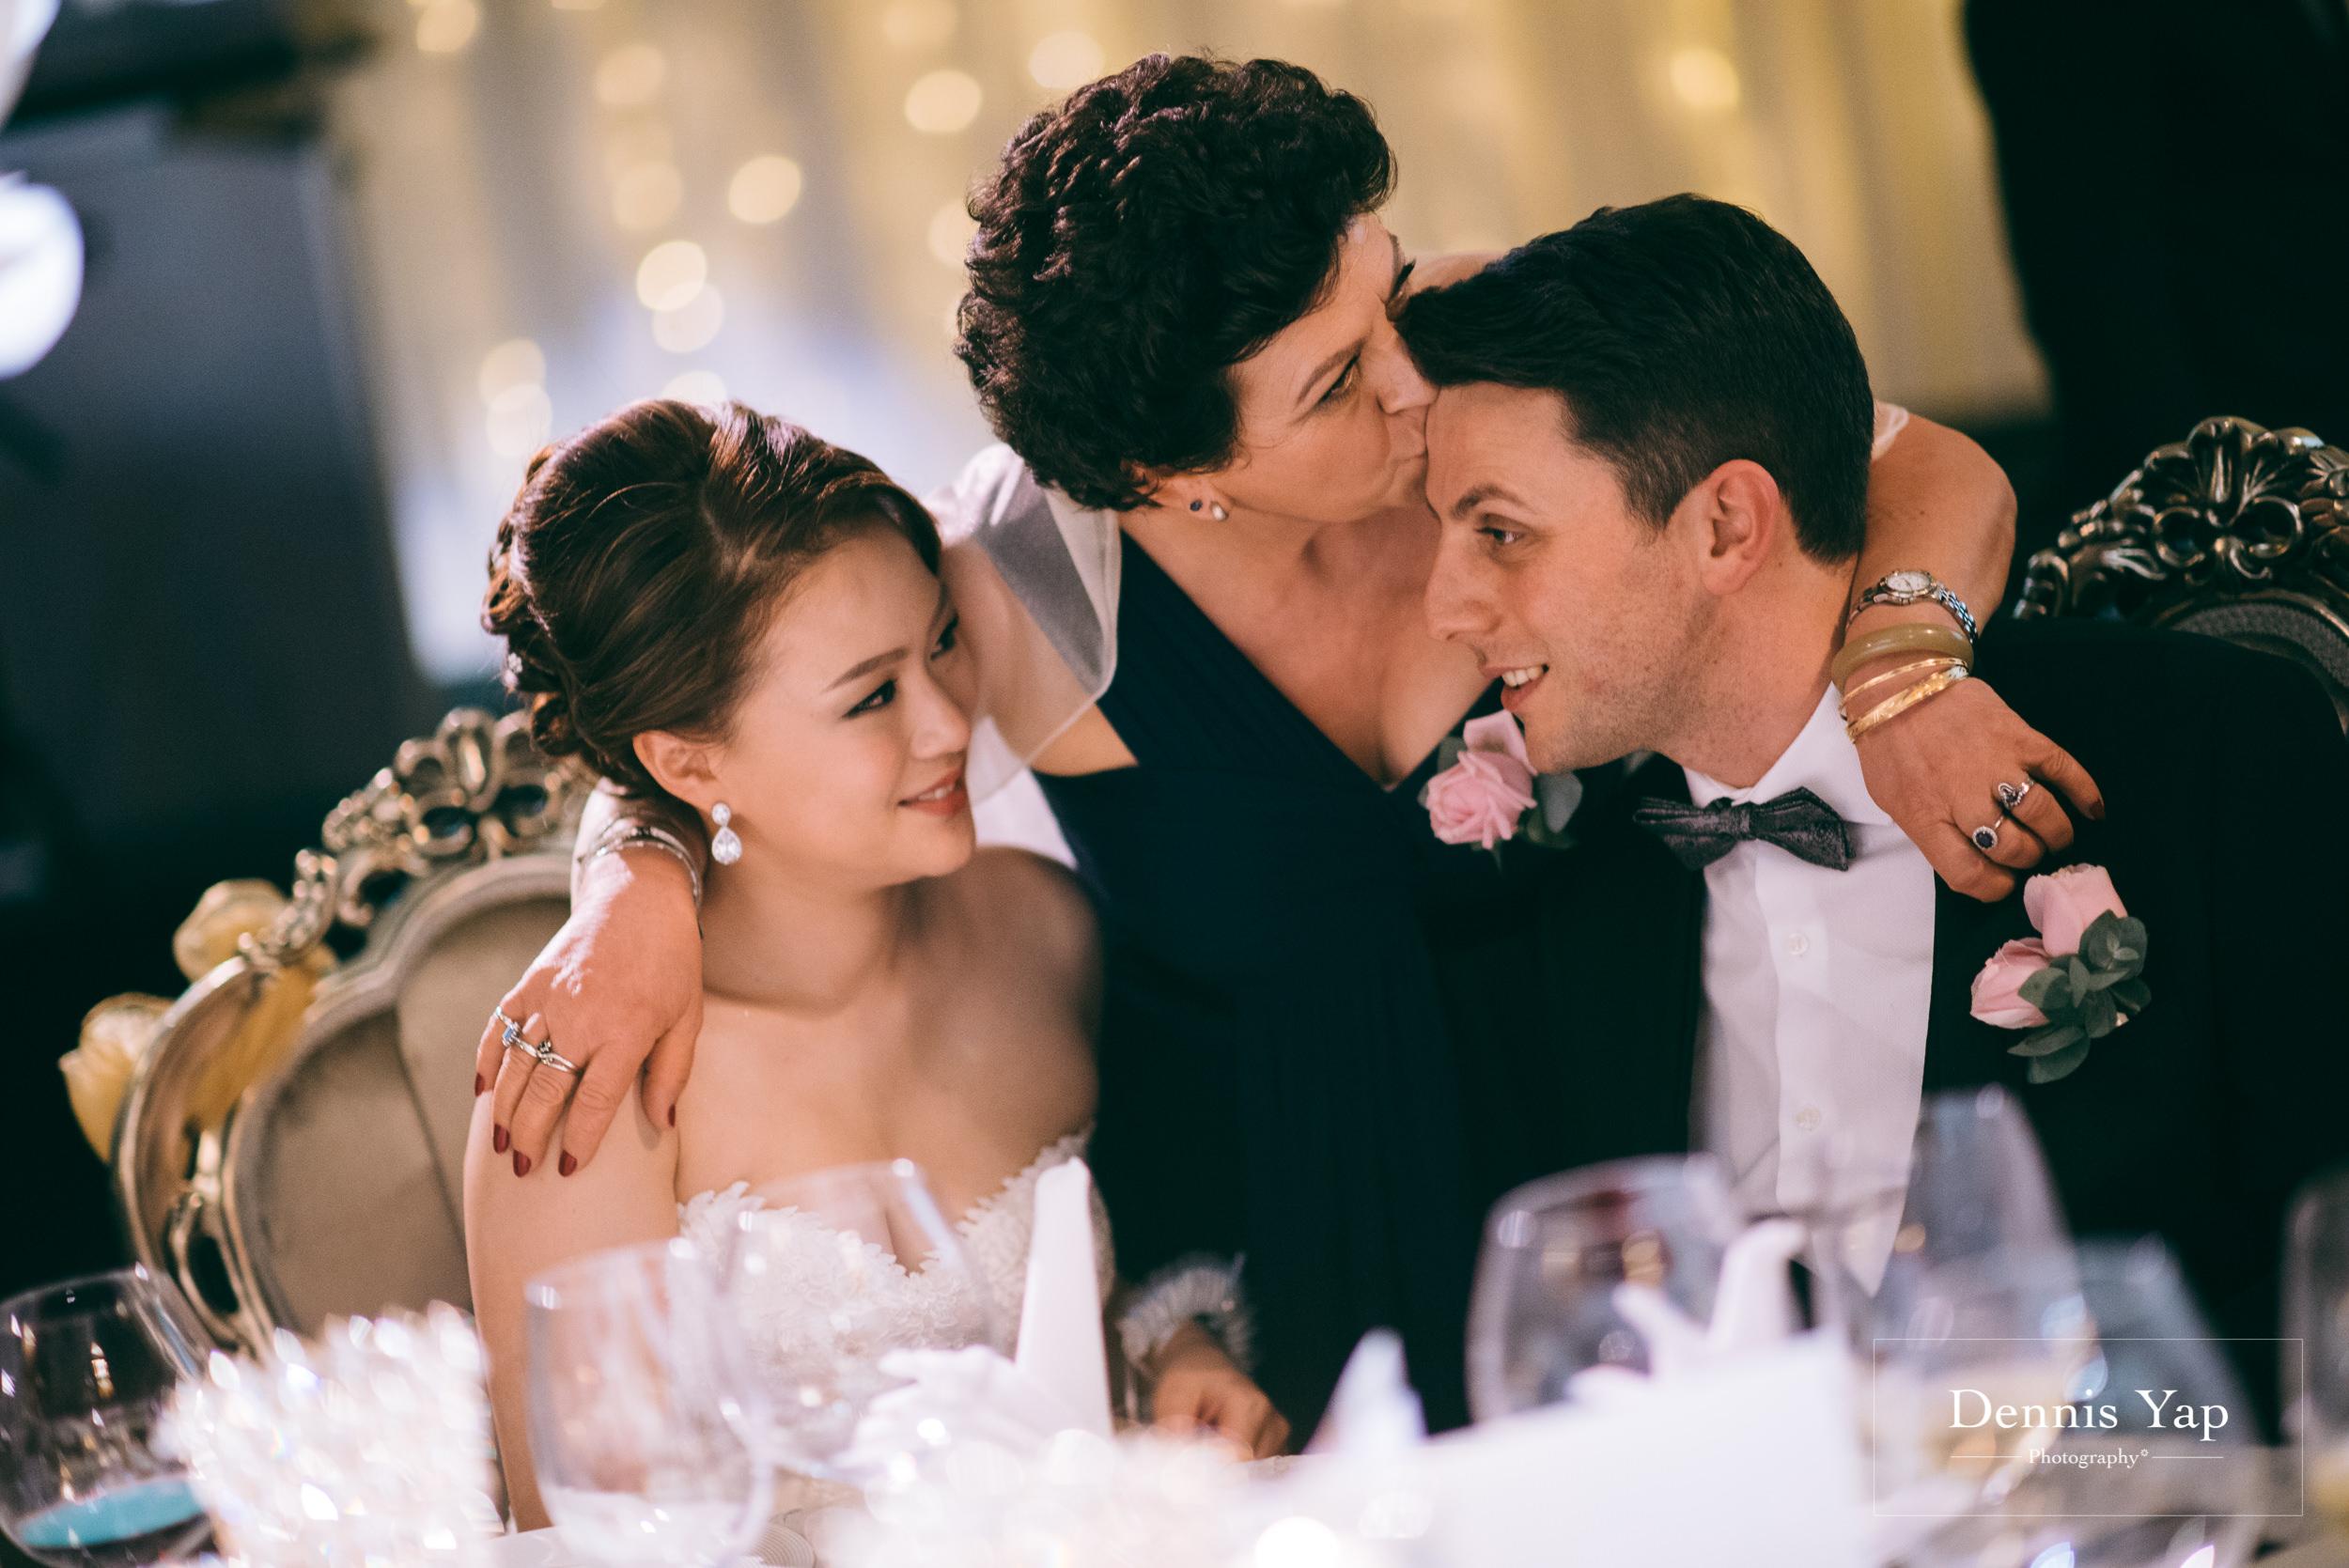 jordan amanda wedding day westin hotel kuala lumpur choe family dennis yap photography-26.jpg